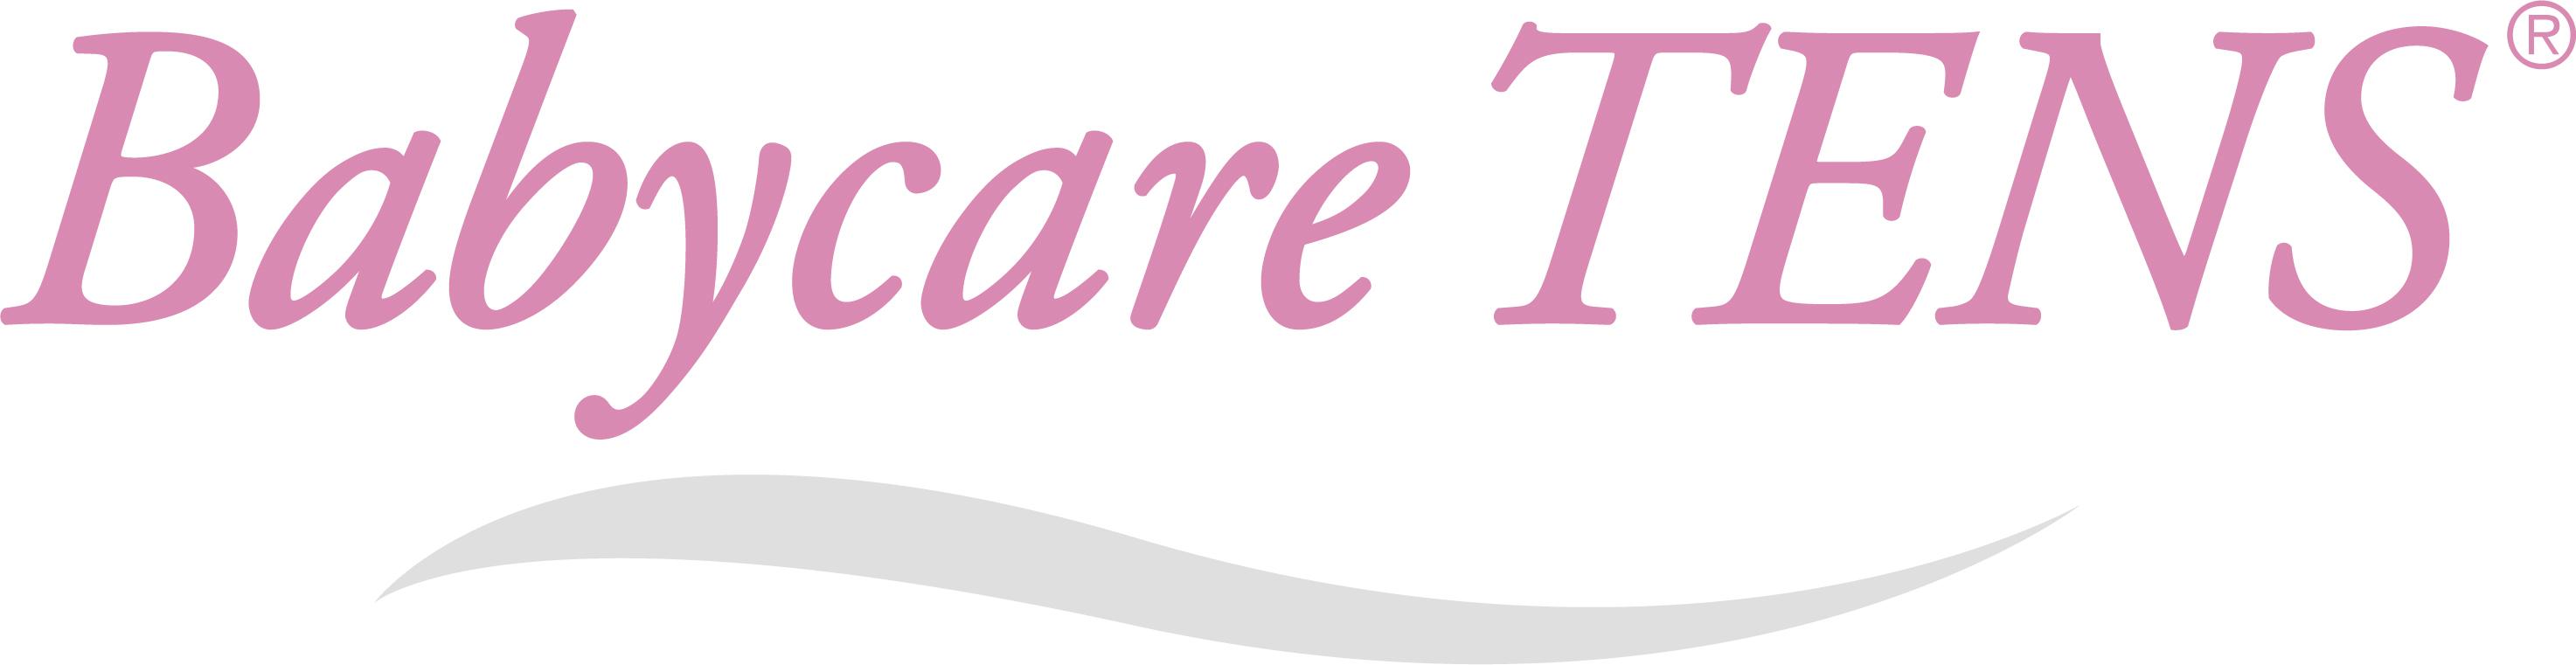 babycare-tens-logo-2017.jpg